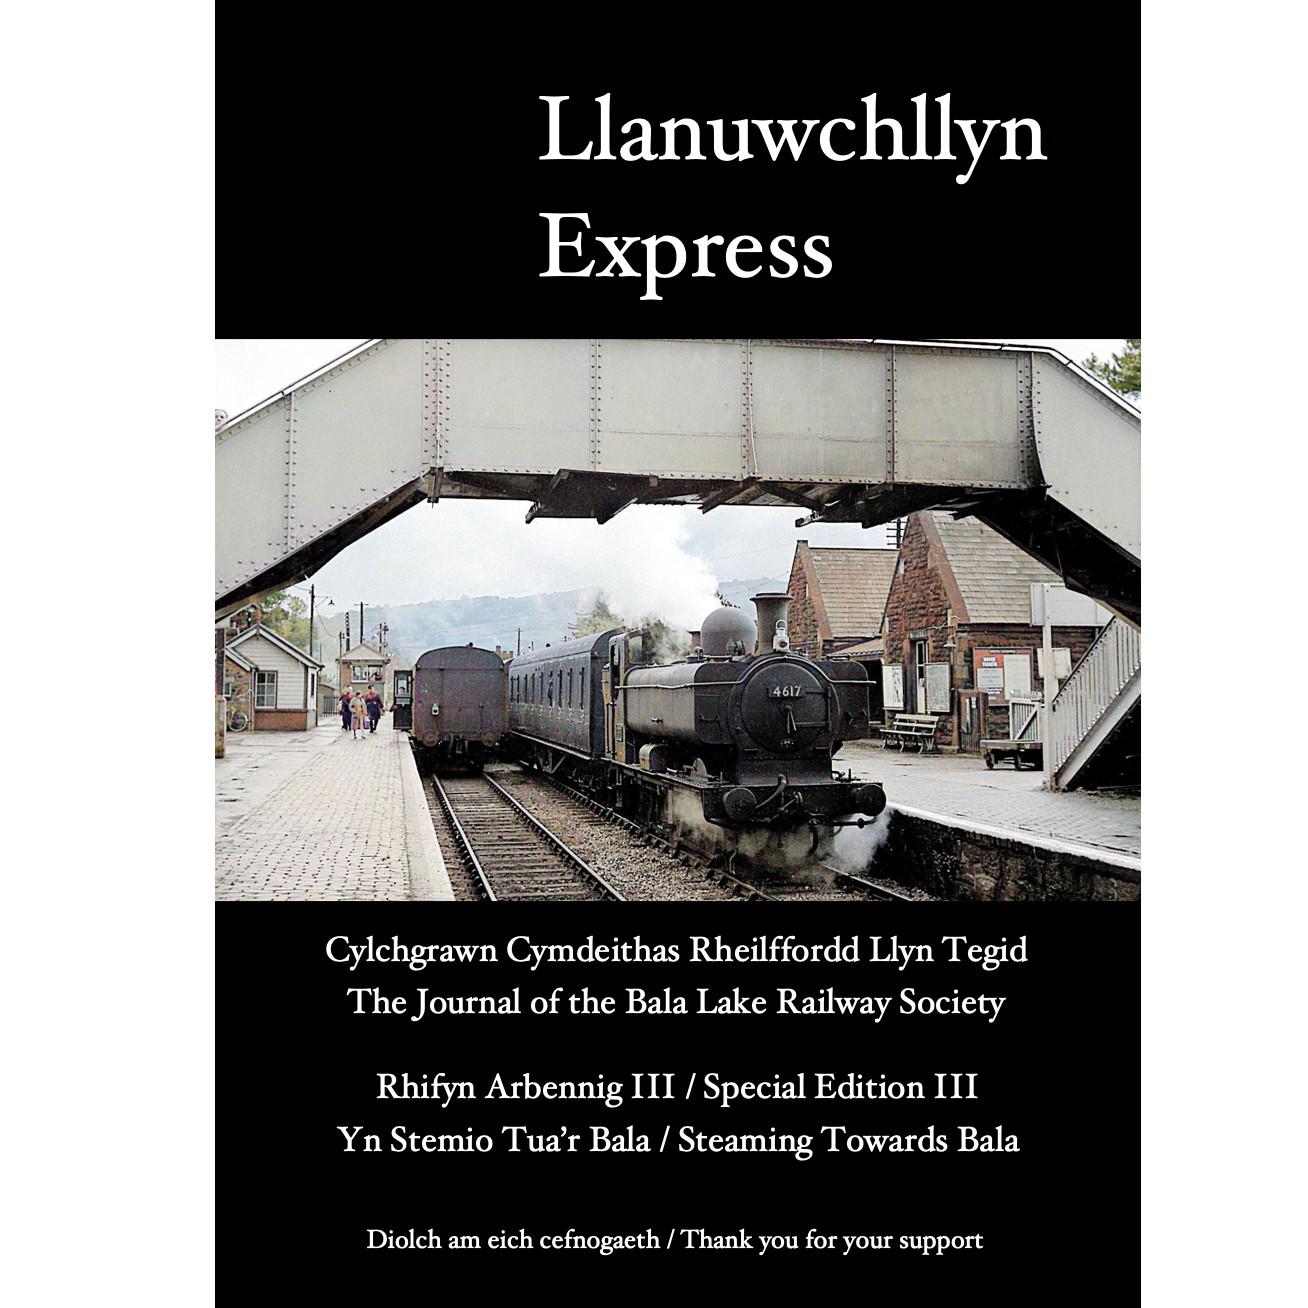 Llanuwchllyn Express – Special Edition 3: Steaming Towards Bala